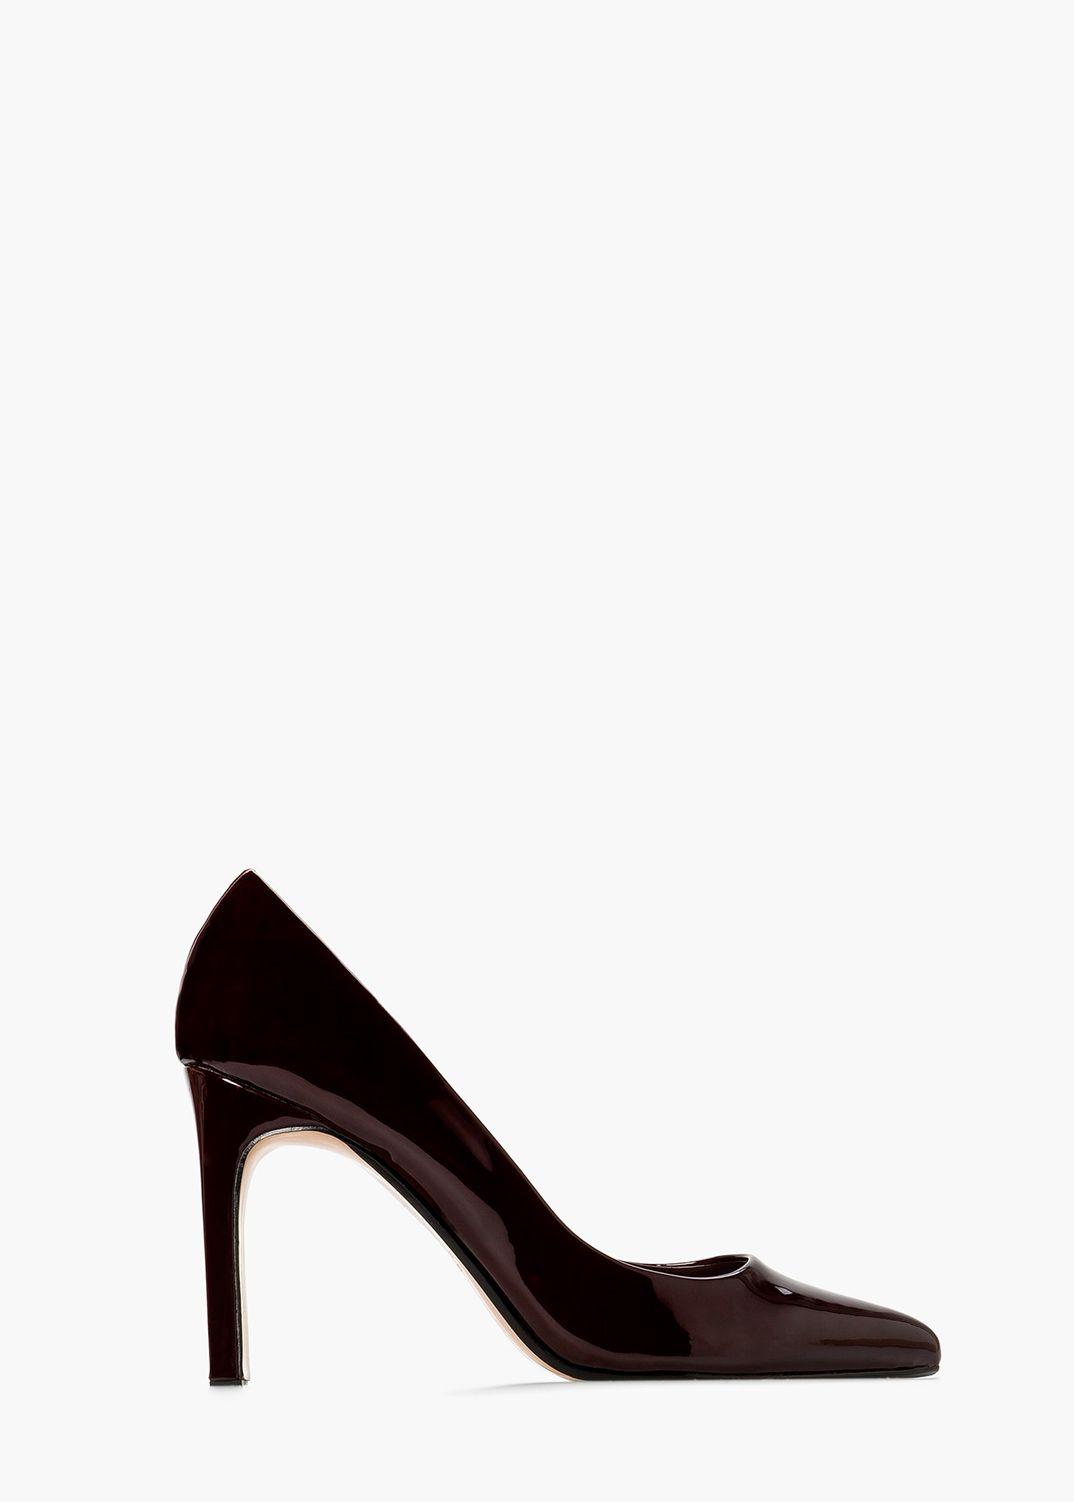 A-divina: 3 looks en rebajas #moda #fashion